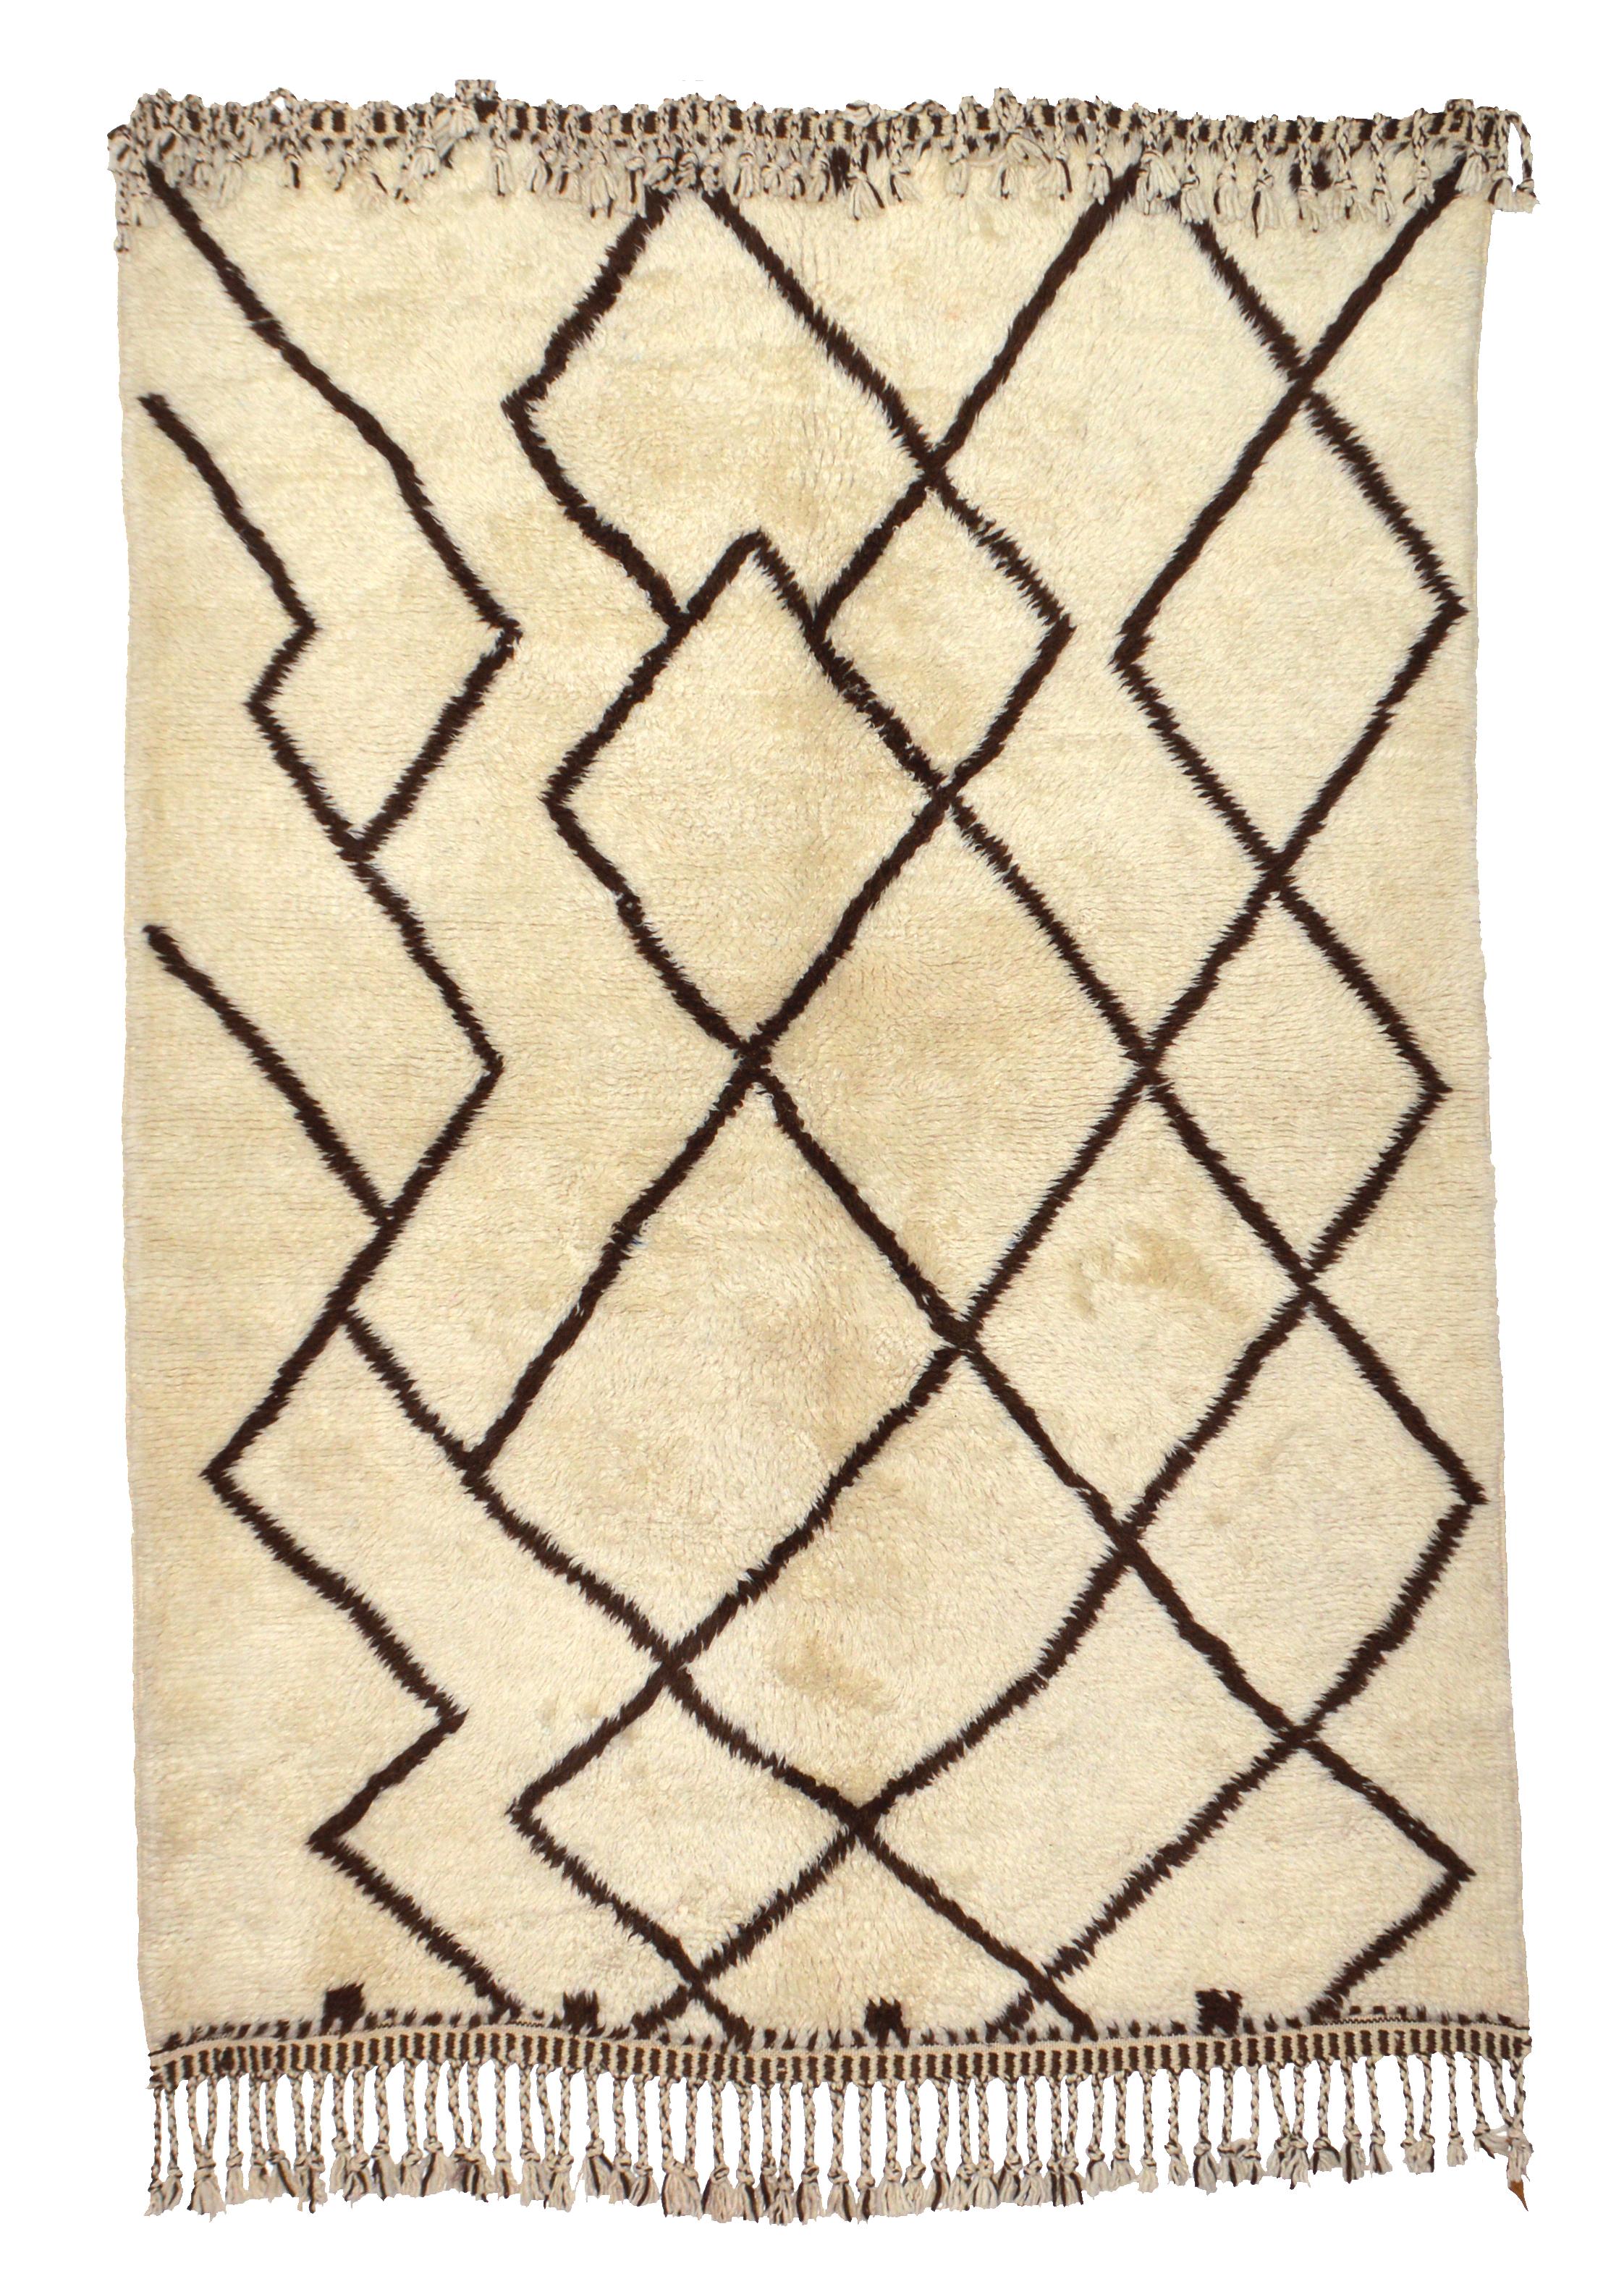 Beni Ourain BN 02- 215 x 150 cm